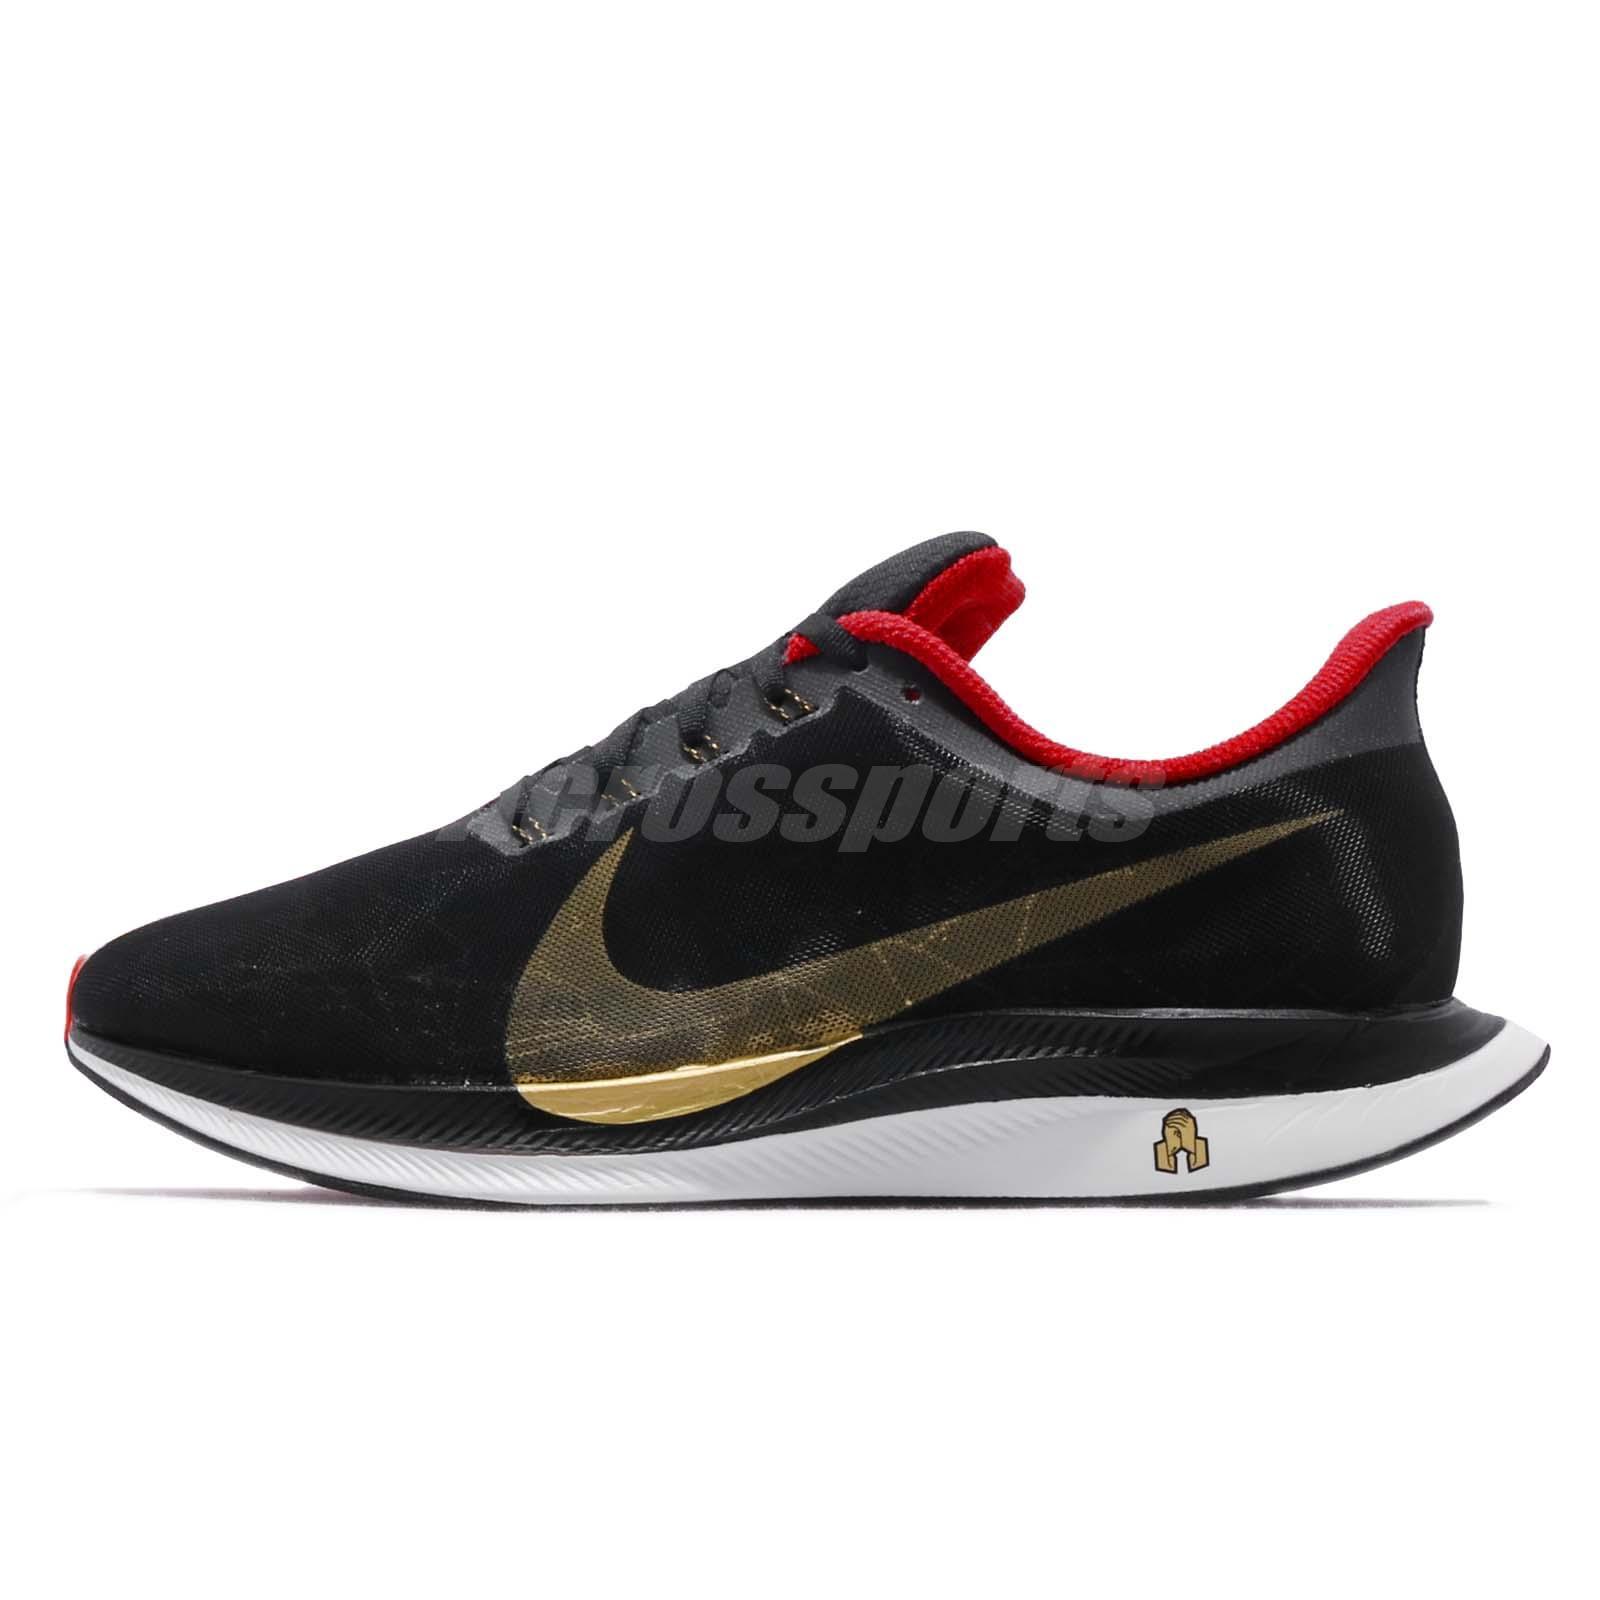 e715e15ffa972 Nike Zoom Pegasus 35 Turbo CNY Chinese New Year Men Shoes Sneakers  BV6656-016